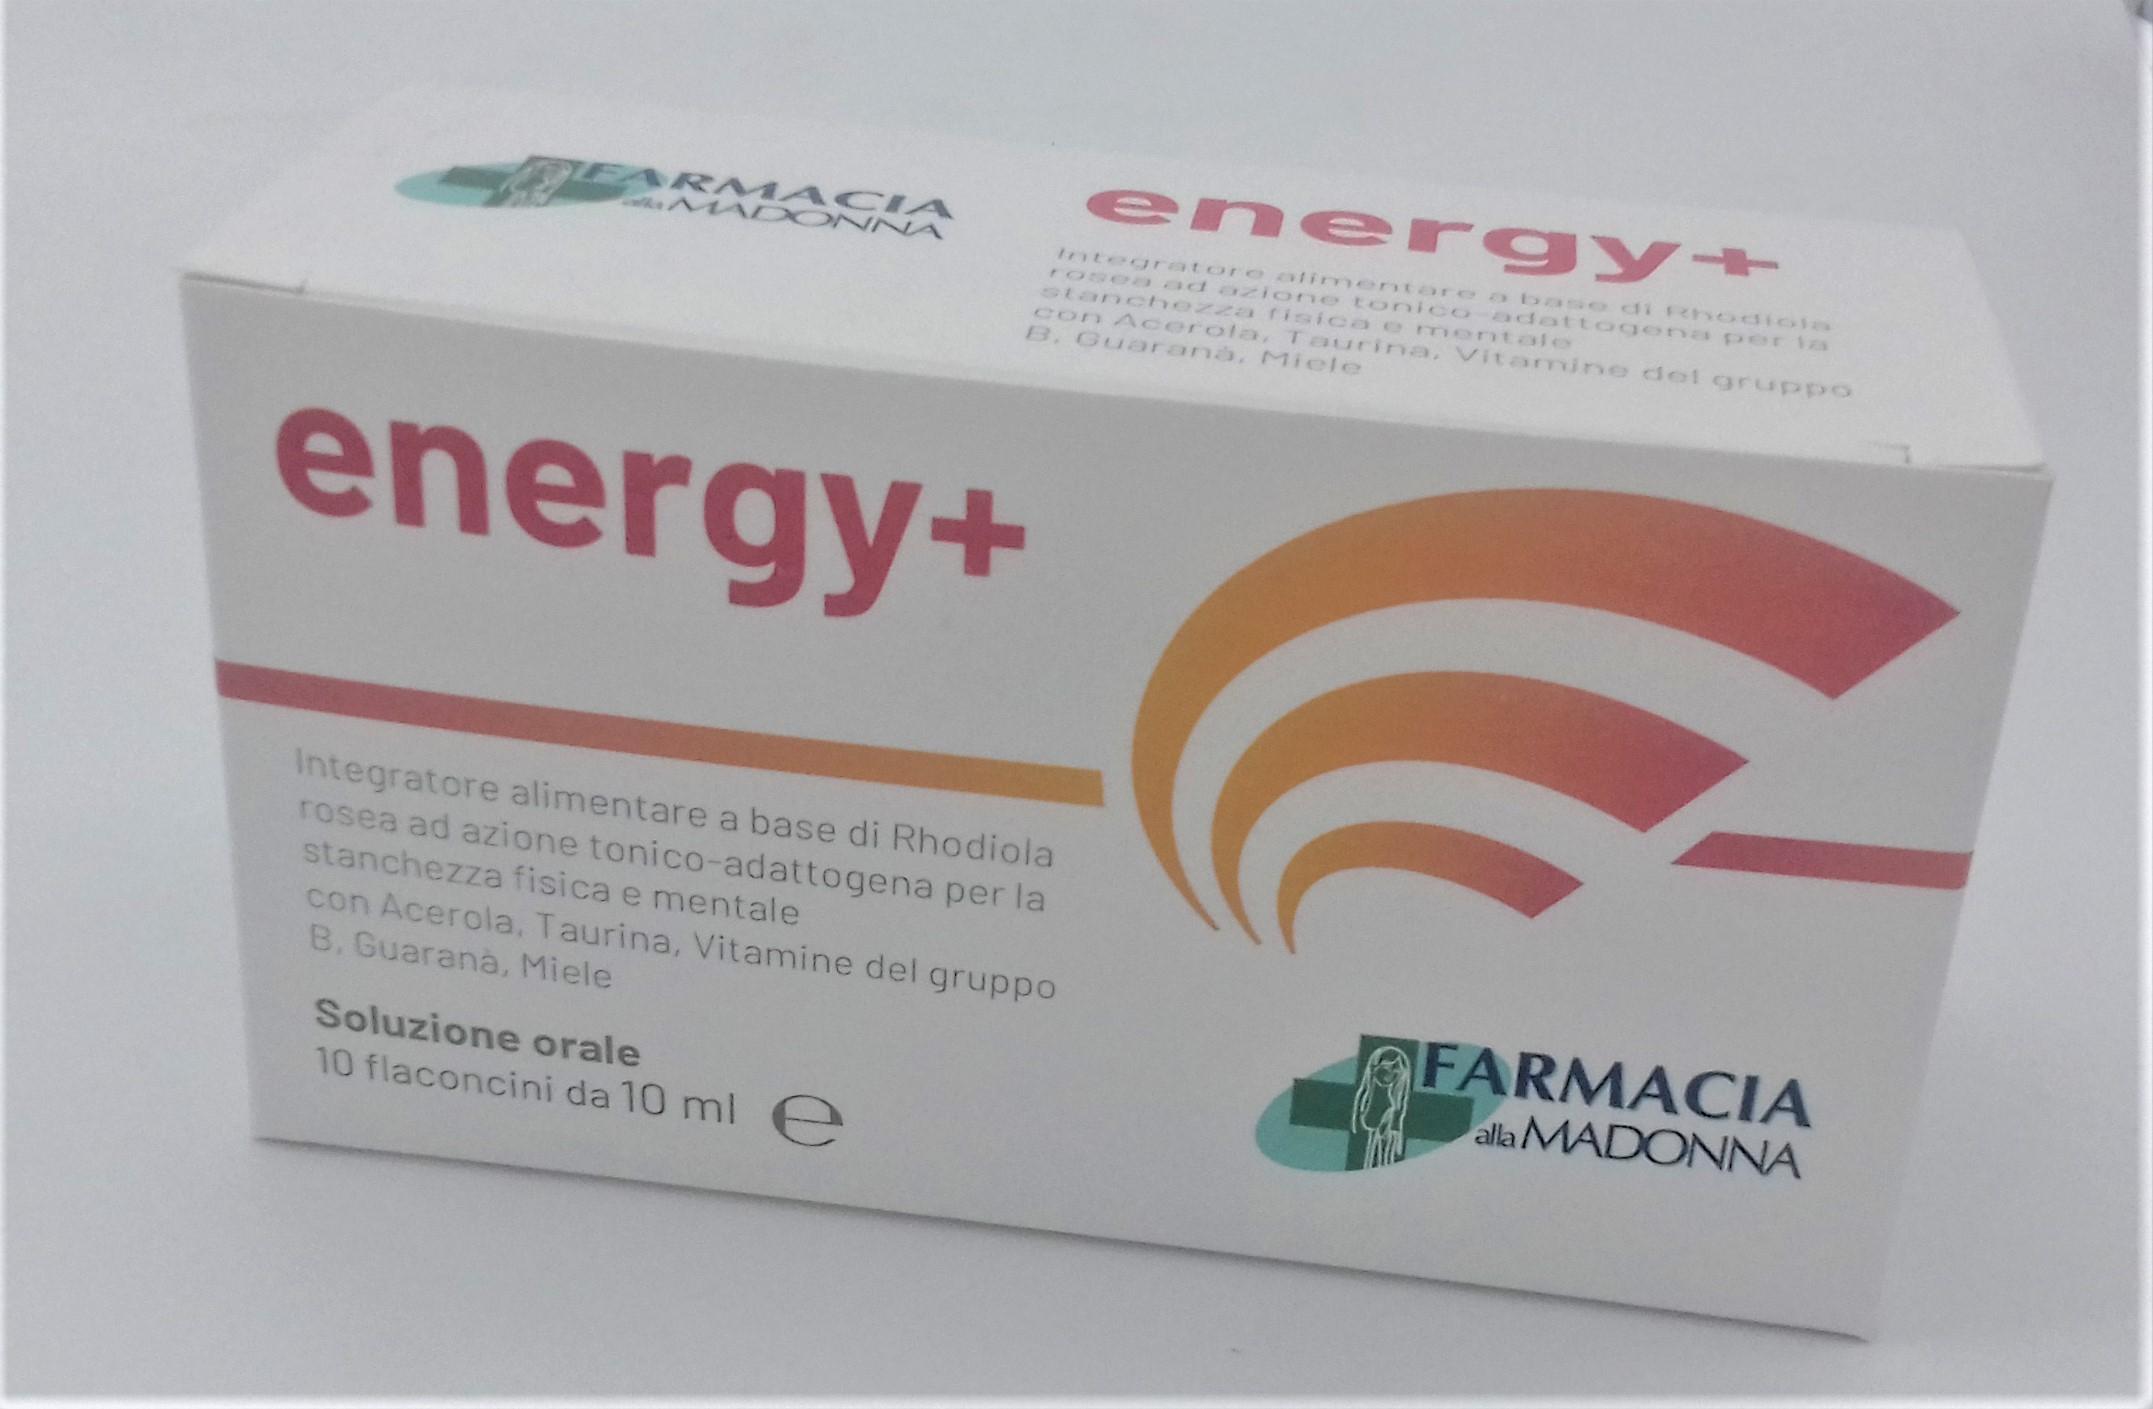 ENERGY+  10 FLACONCINI  Farmacia alla Madonna